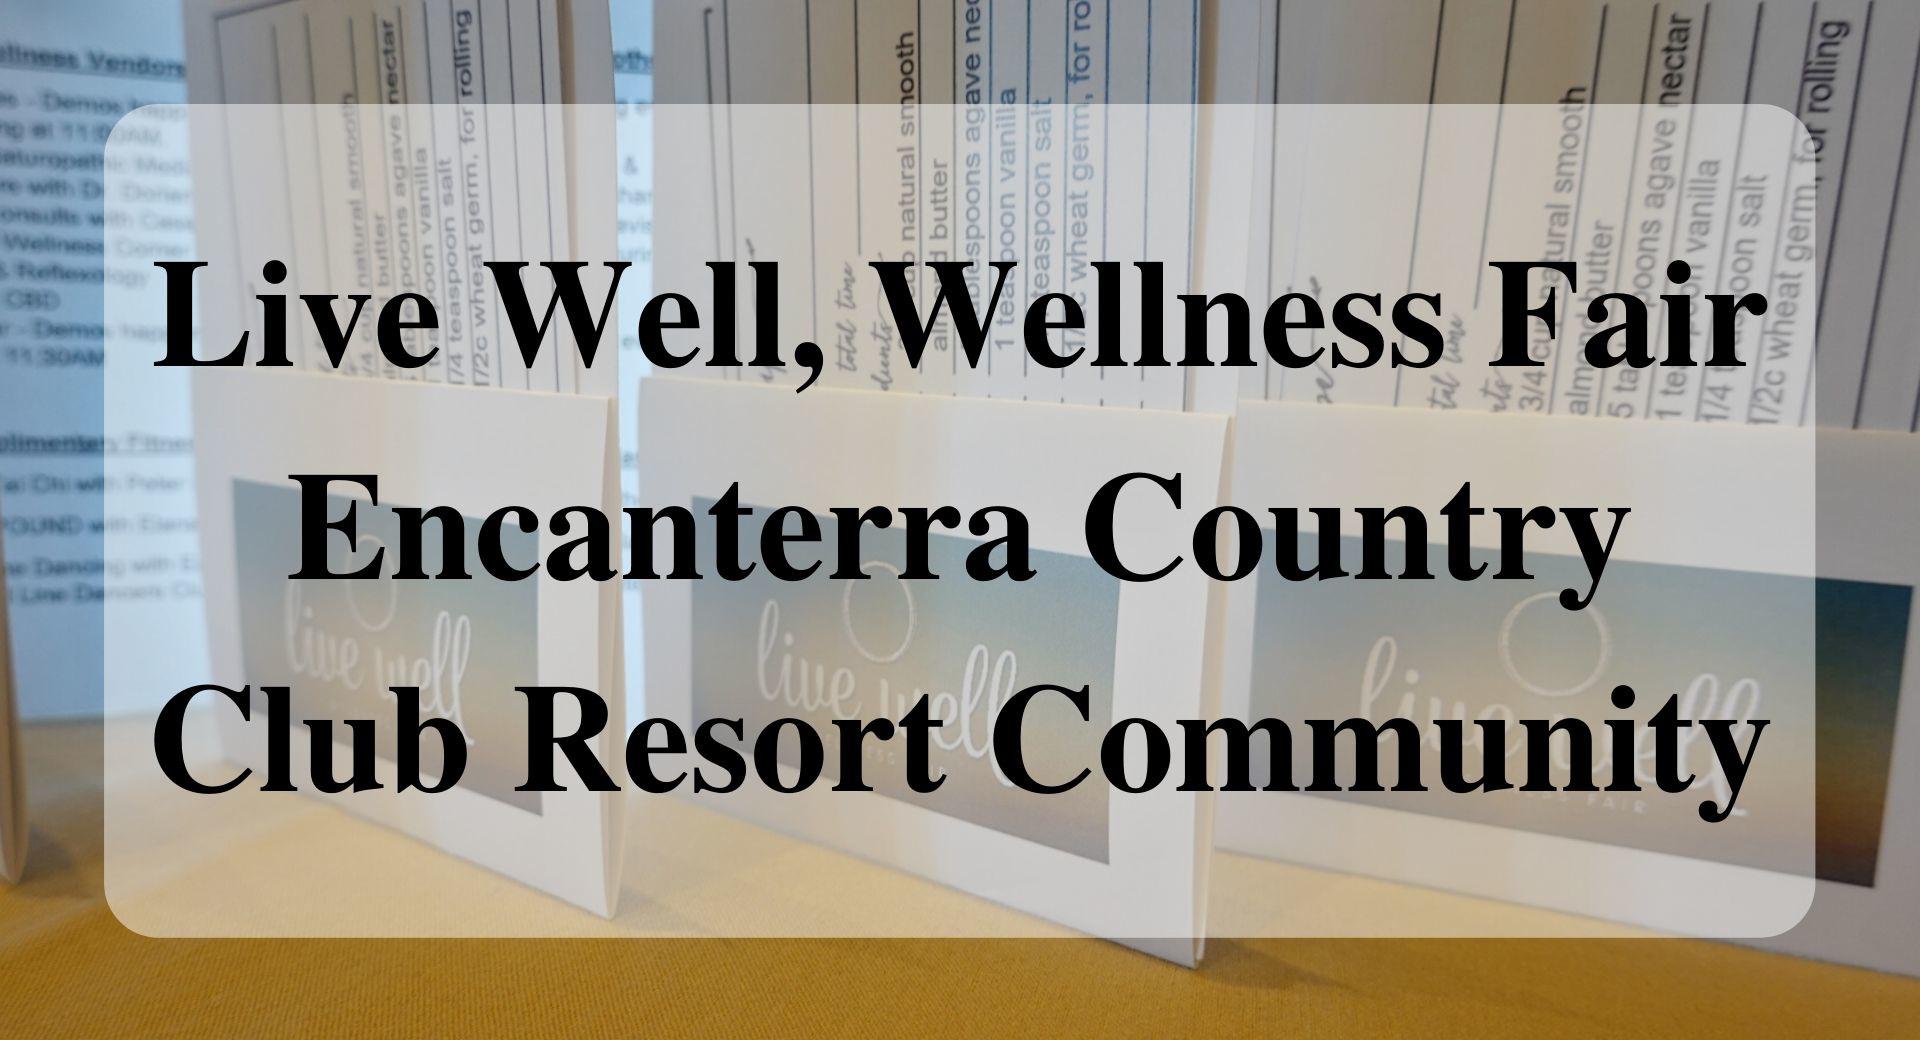 Live Well, Wellness Fair Encanterra Country Club Resort Community forever sabbatical